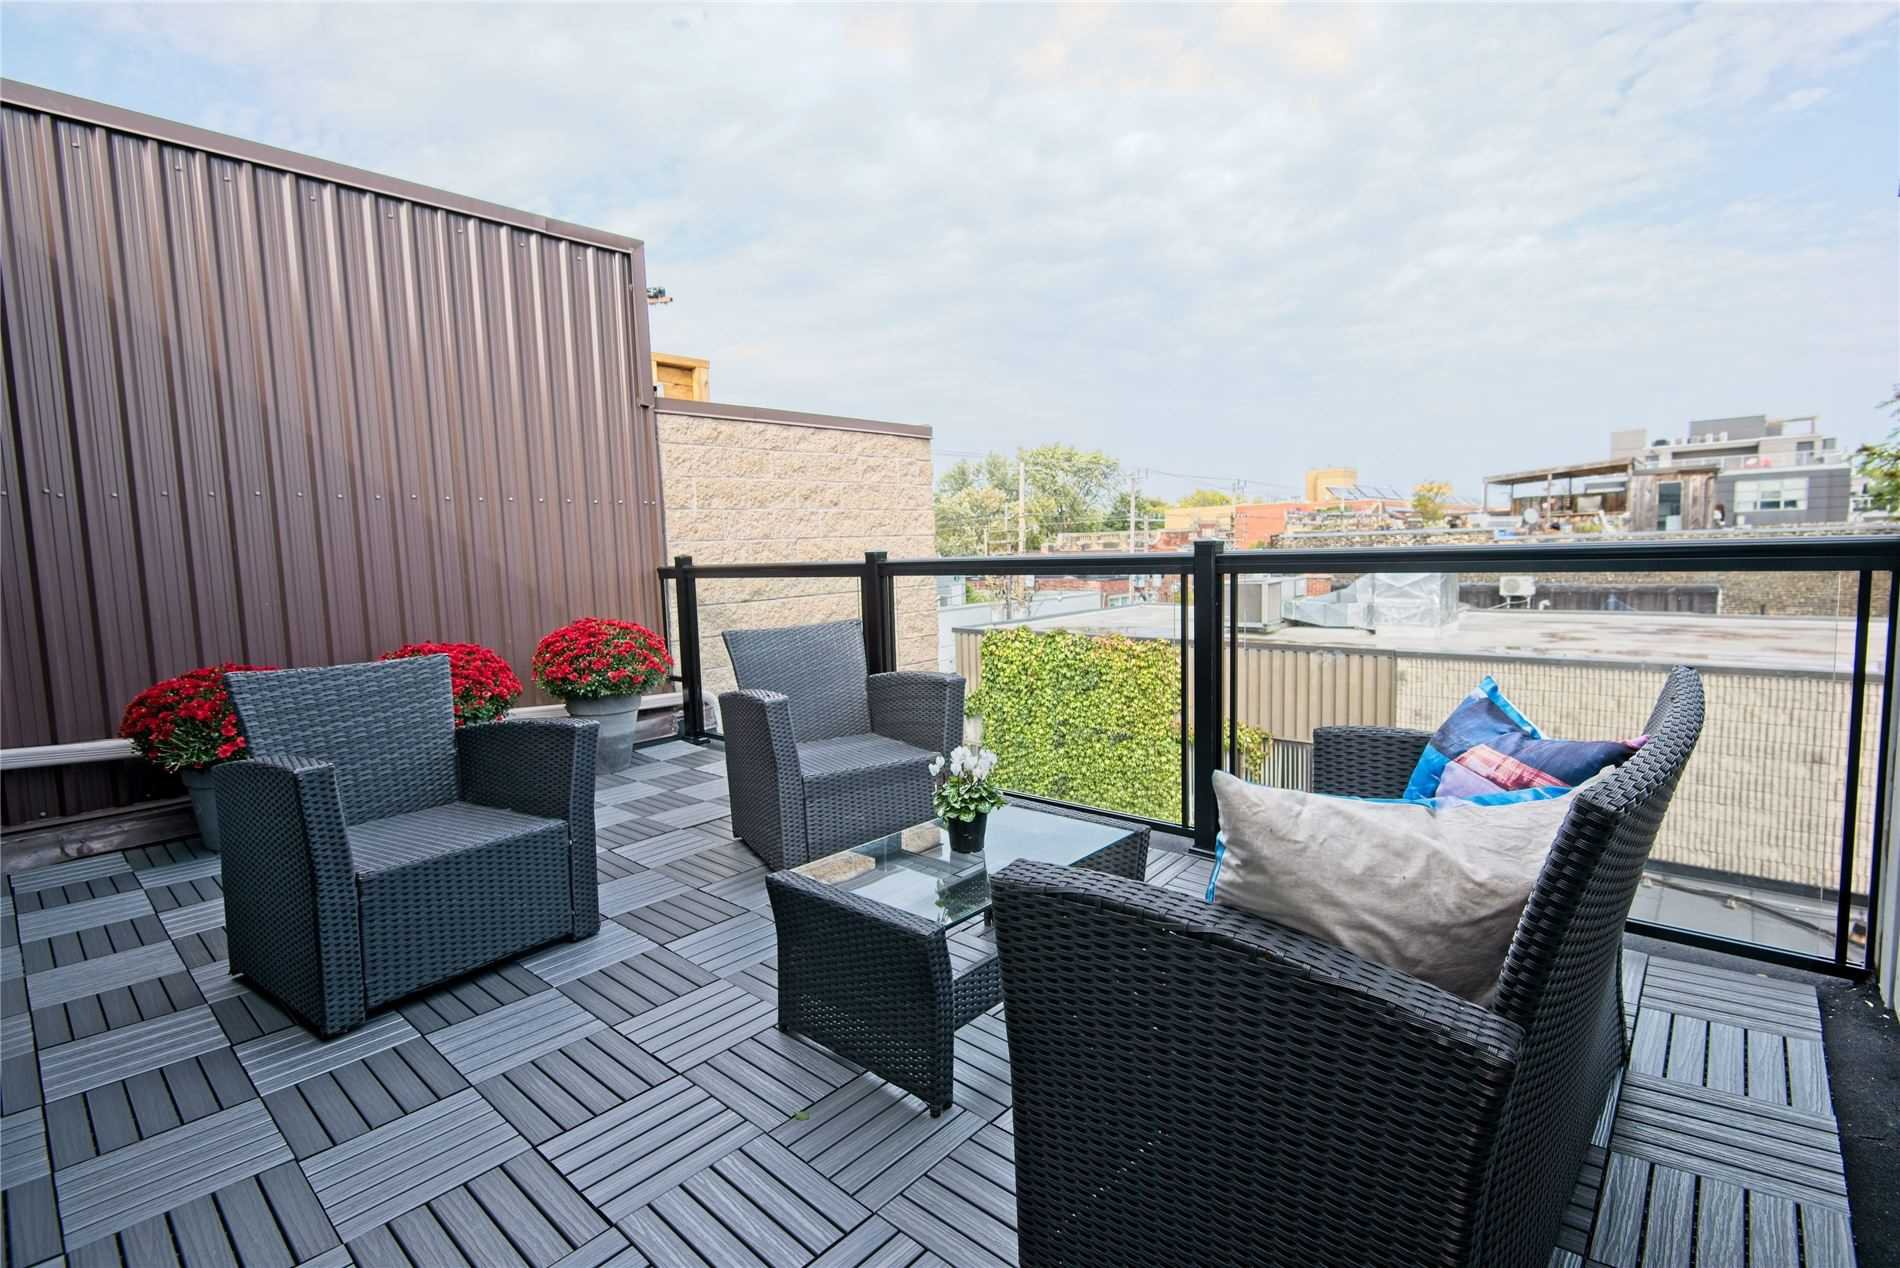 Photo 24: Photos: 213 Heward Avenue in Toronto: South Riverdale House (3-Storey) for sale (Toronto E01)  : MLS®# E4941877